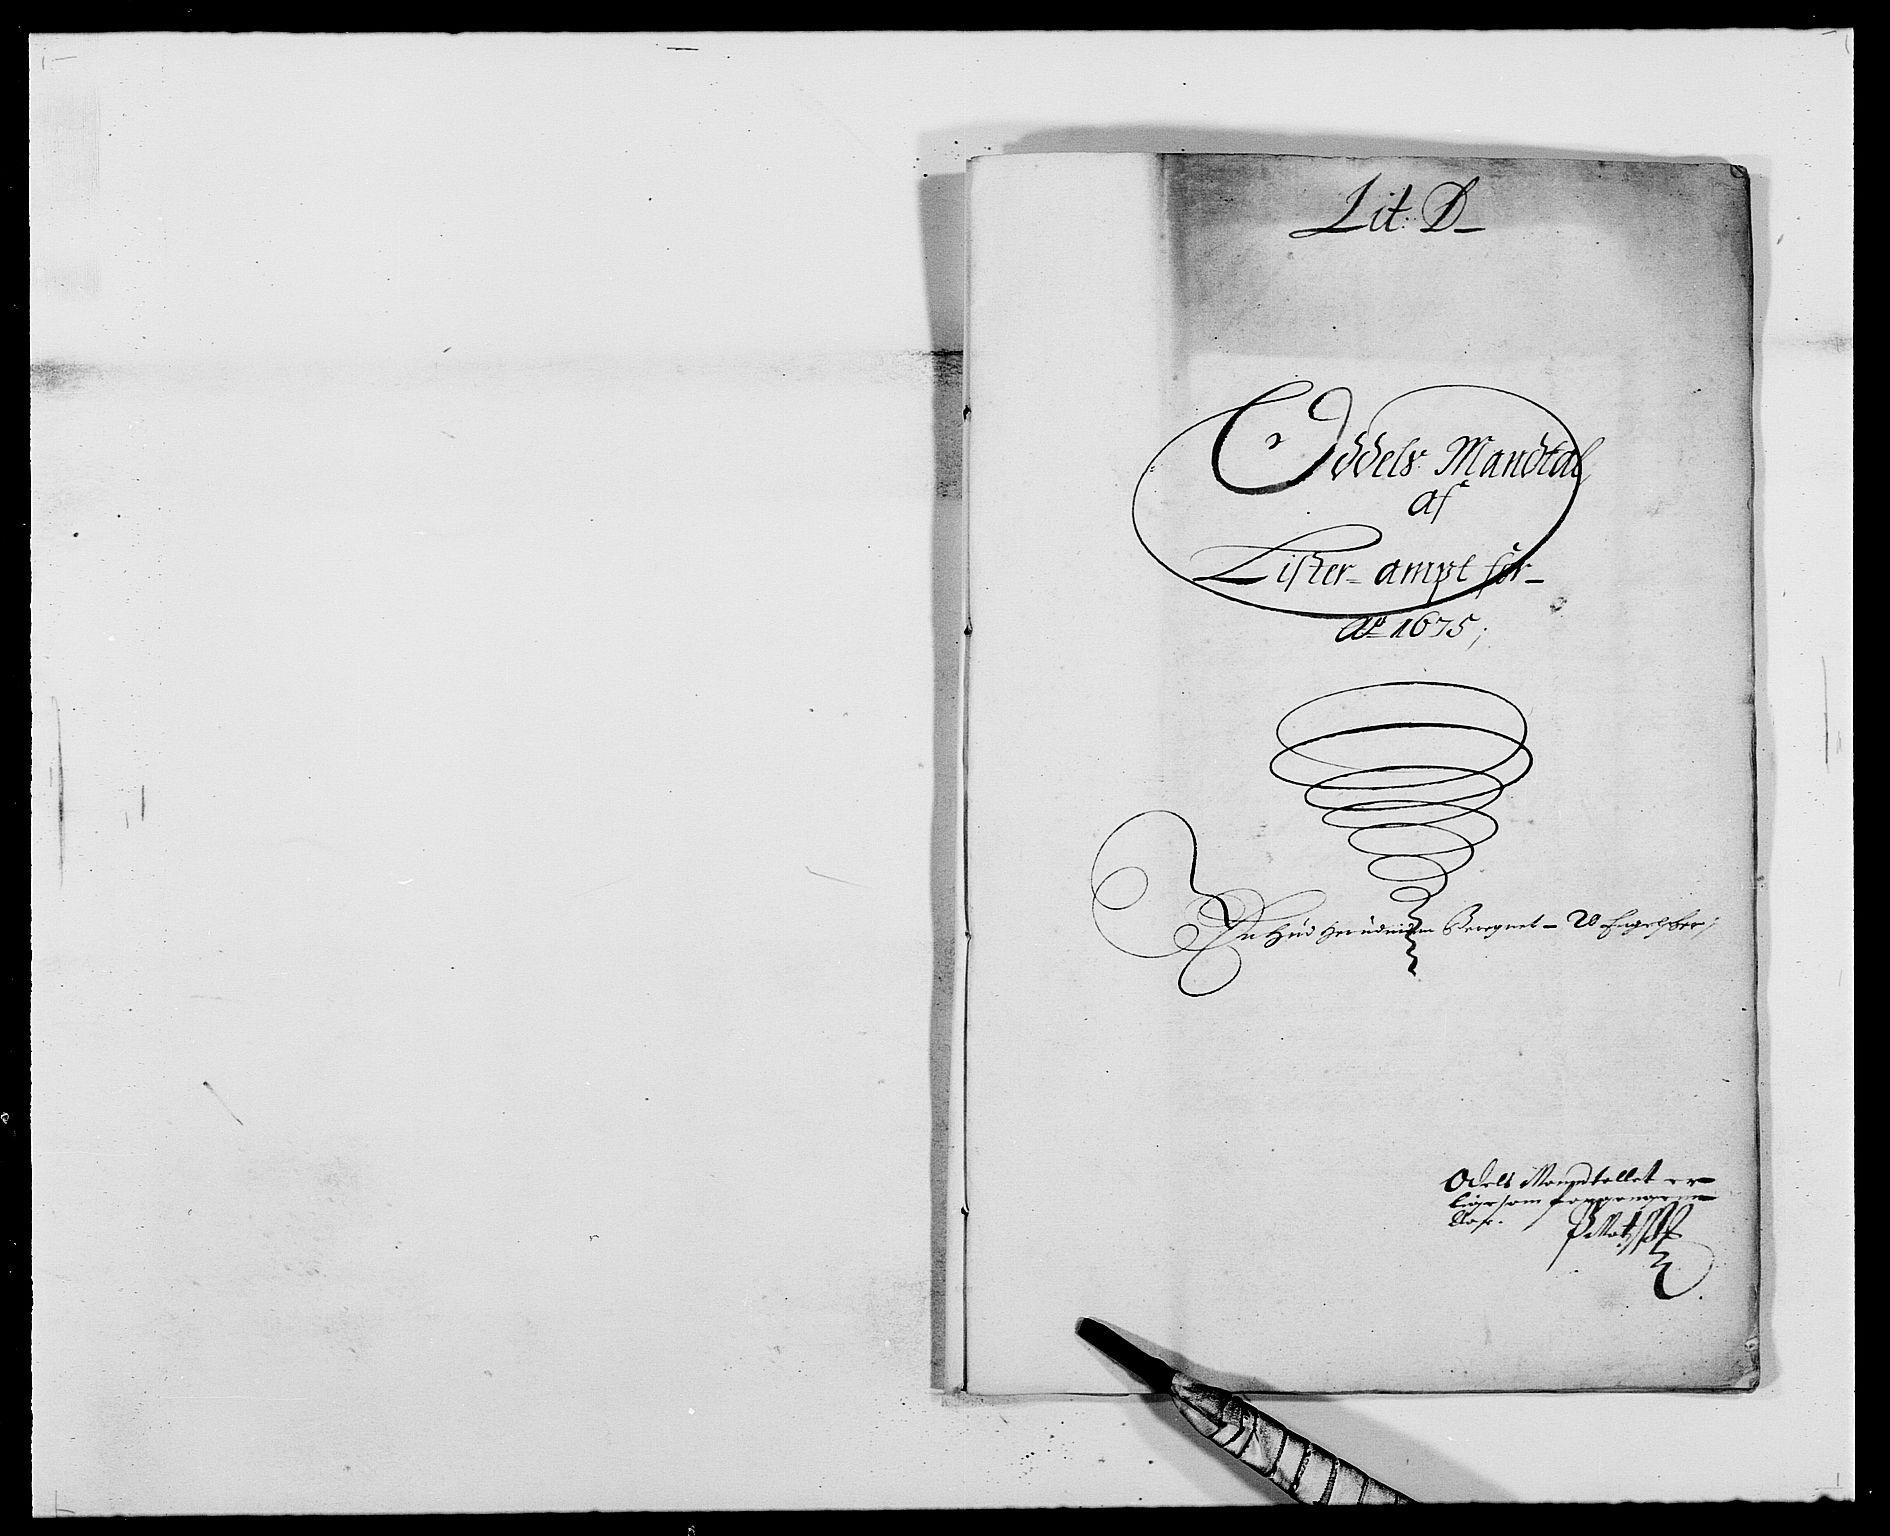 RA, Rentekammeret inntil 1814, Reviderte regnskaper, Fogderegnskap, R41/L2529: Fogderegnskap Lista, 1675-1676, s. 80